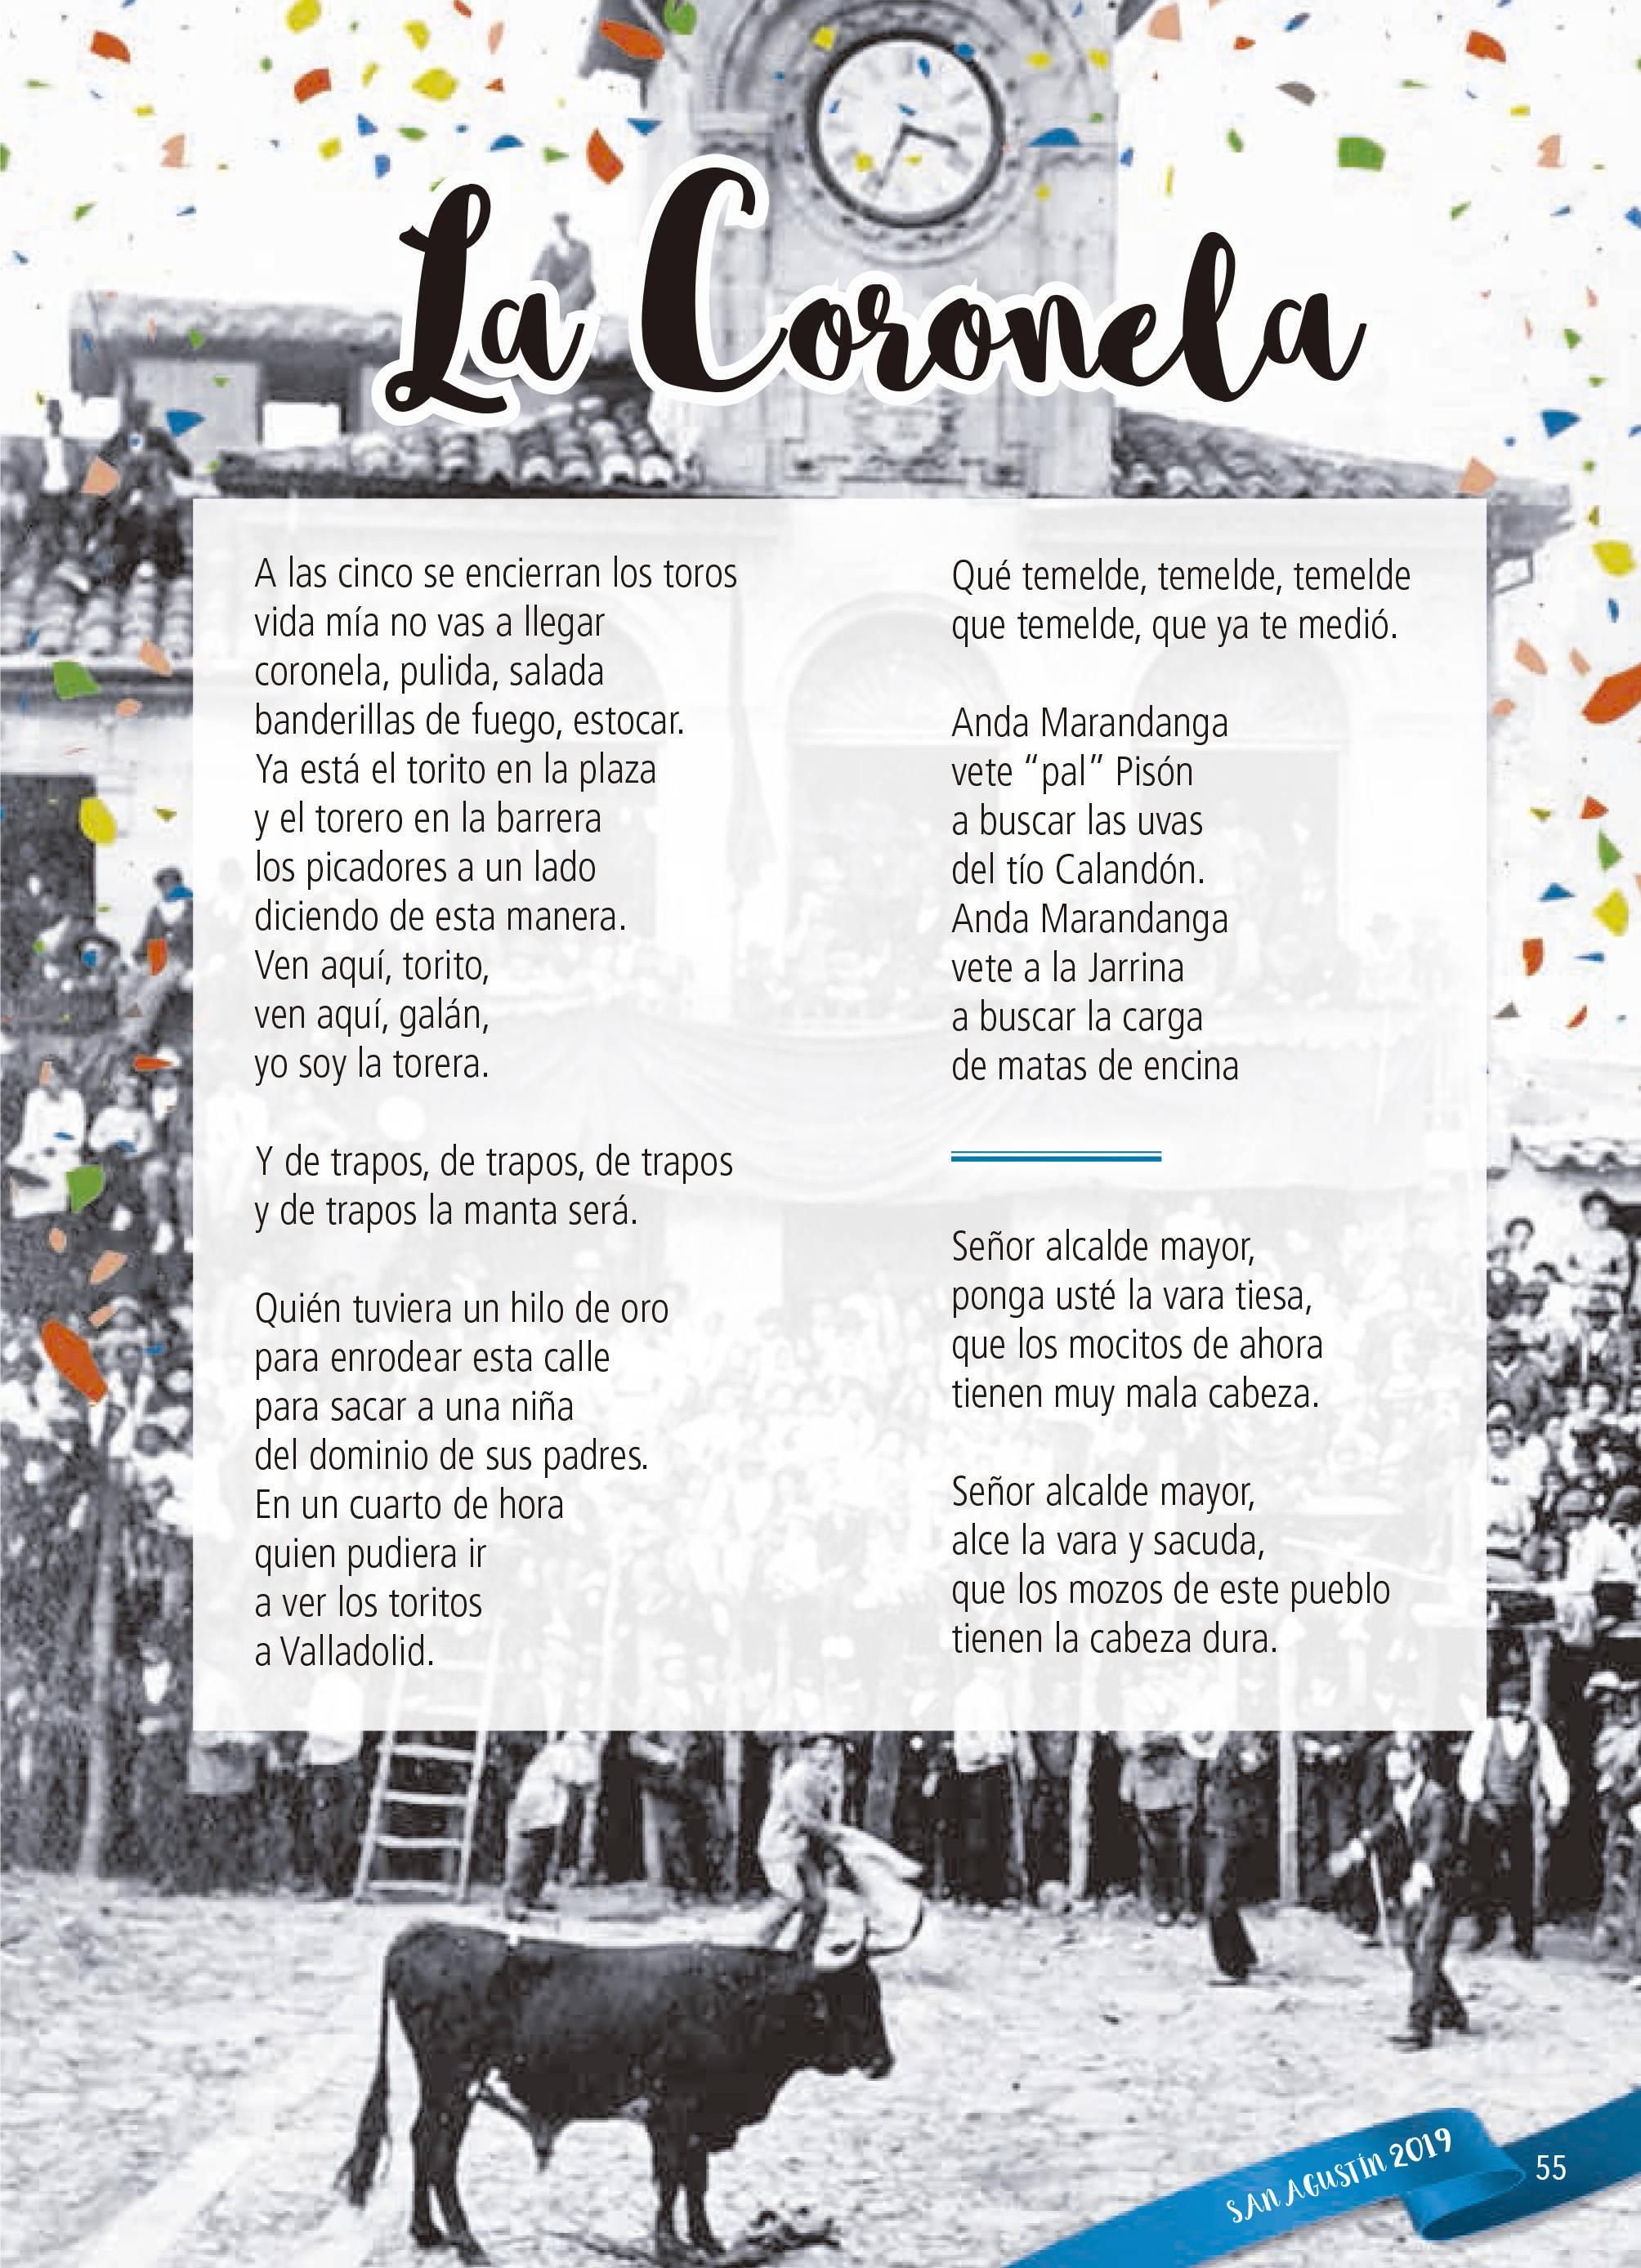 Programa de ferias y fiestas 2019 - Fermoselle (Zamora) 22